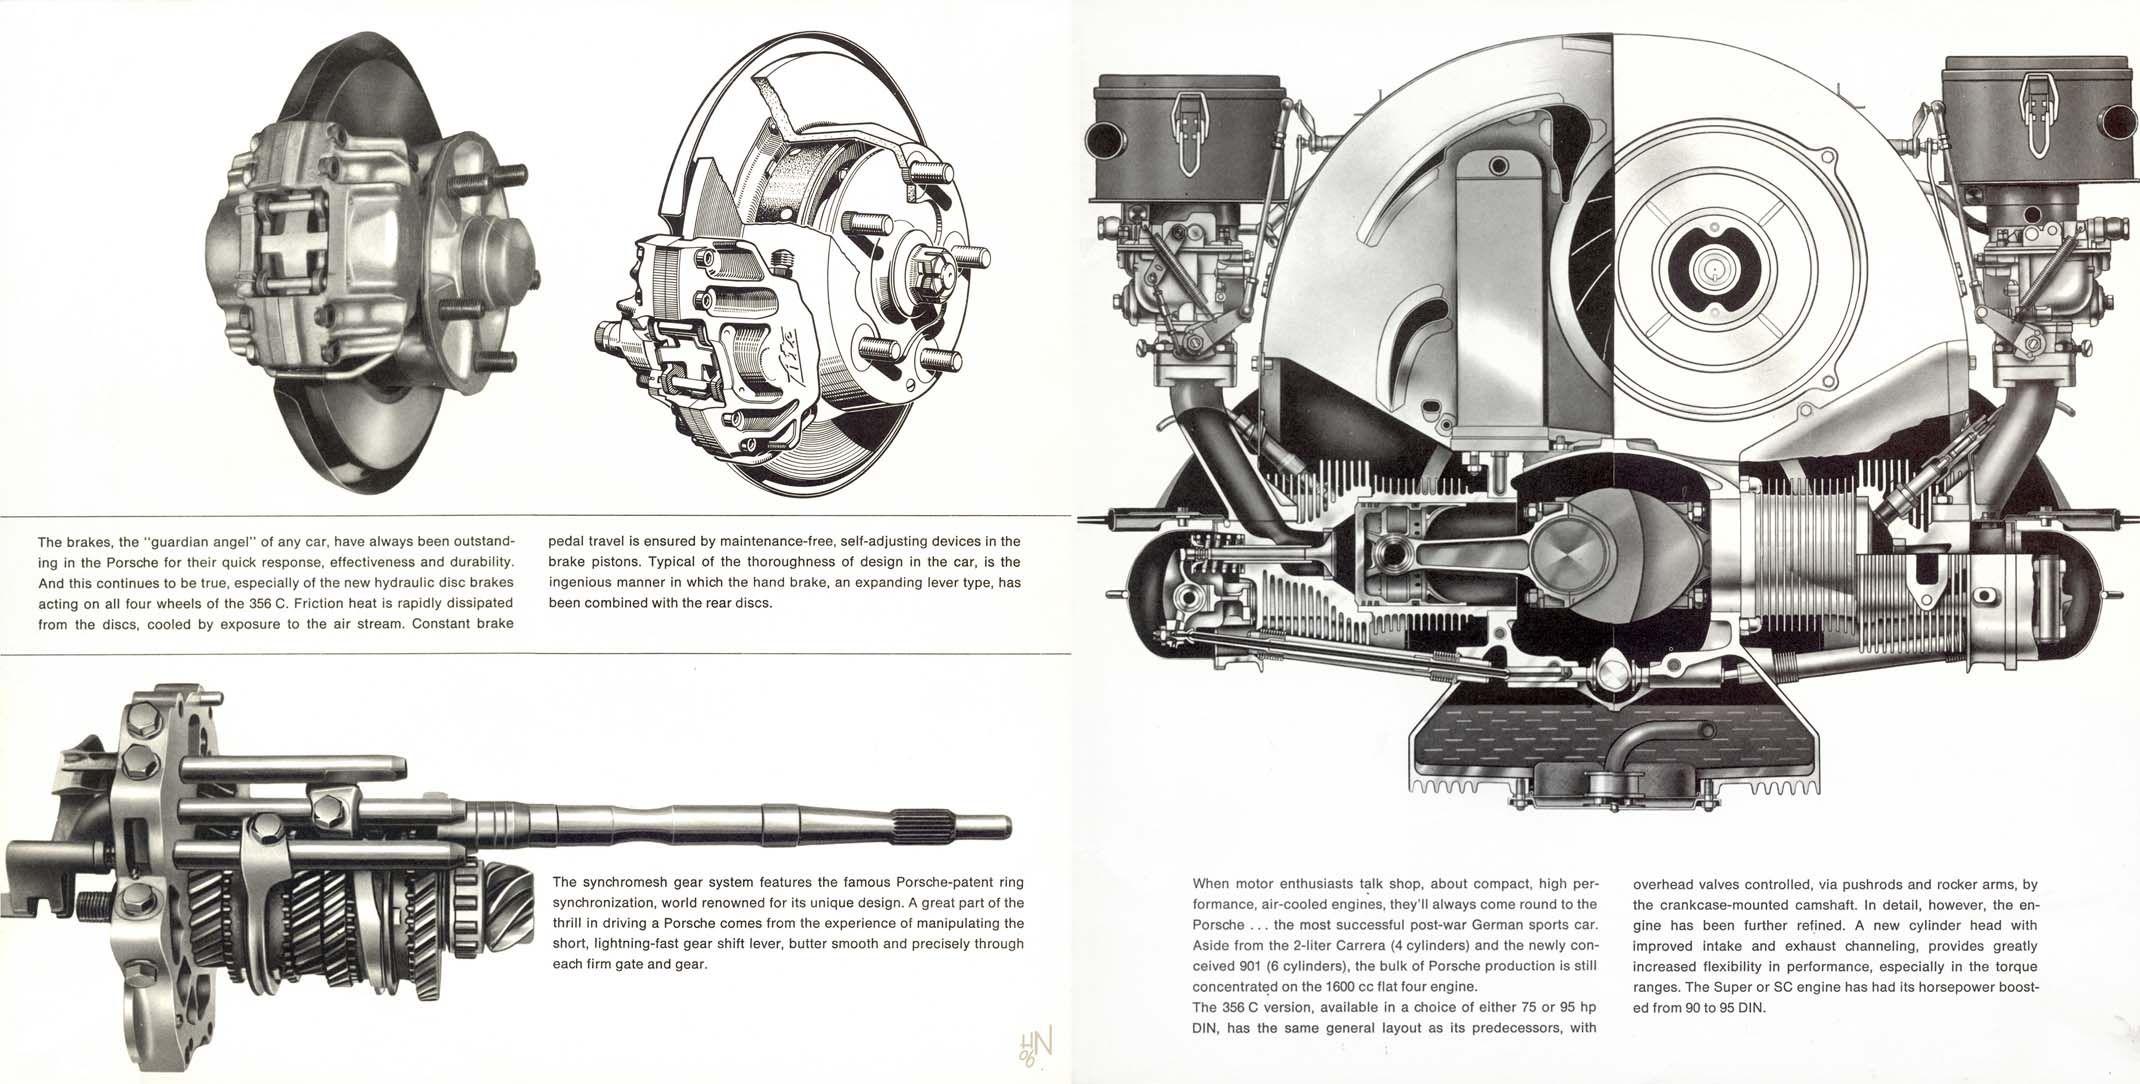 1964 Porsche 356C U.S. brochure page 18 & 19